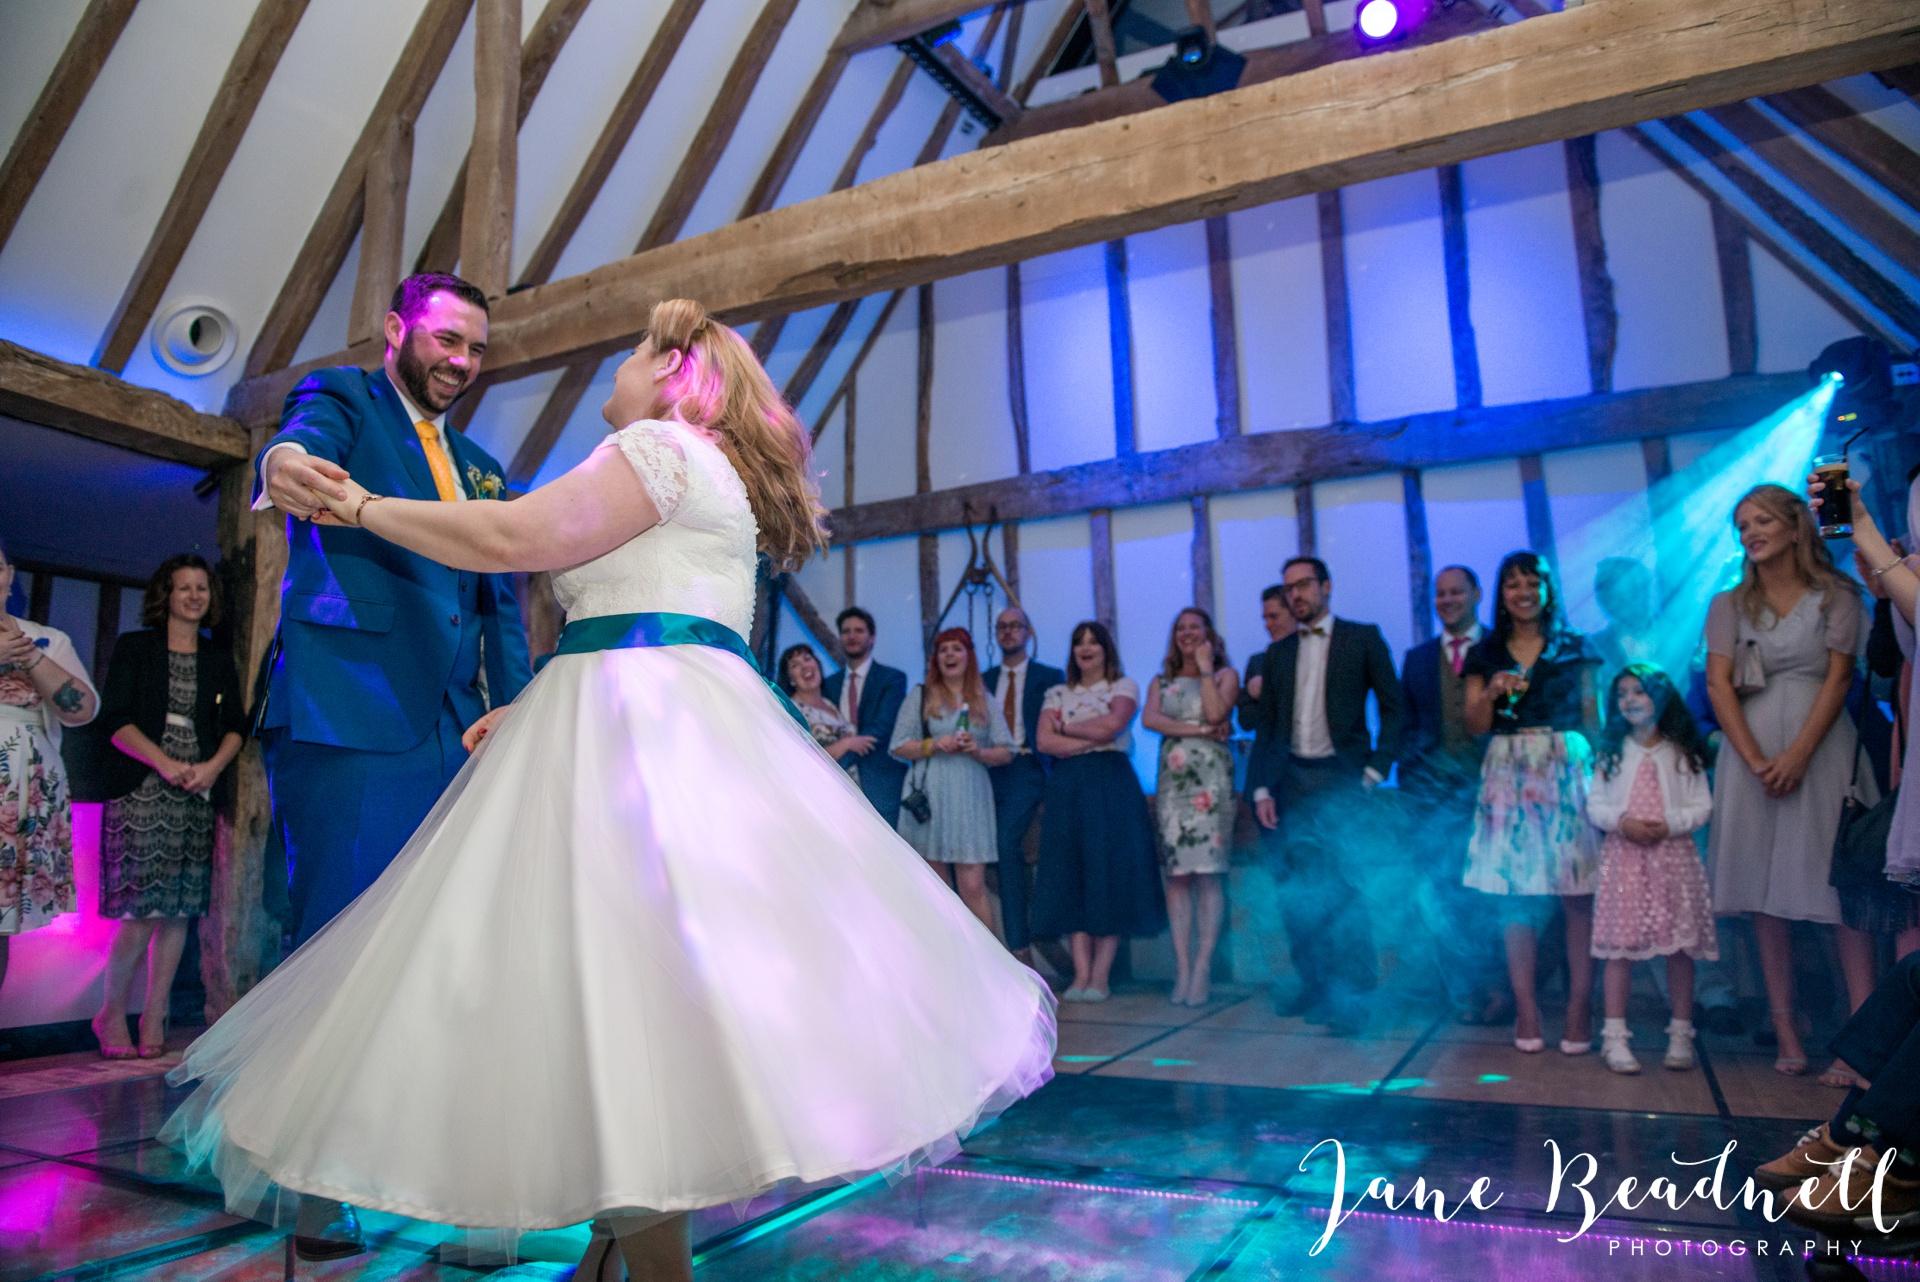 South Farm Wedding photography Hertfordshire by Jane Beadnell Photography fine art wedding photographer_0213